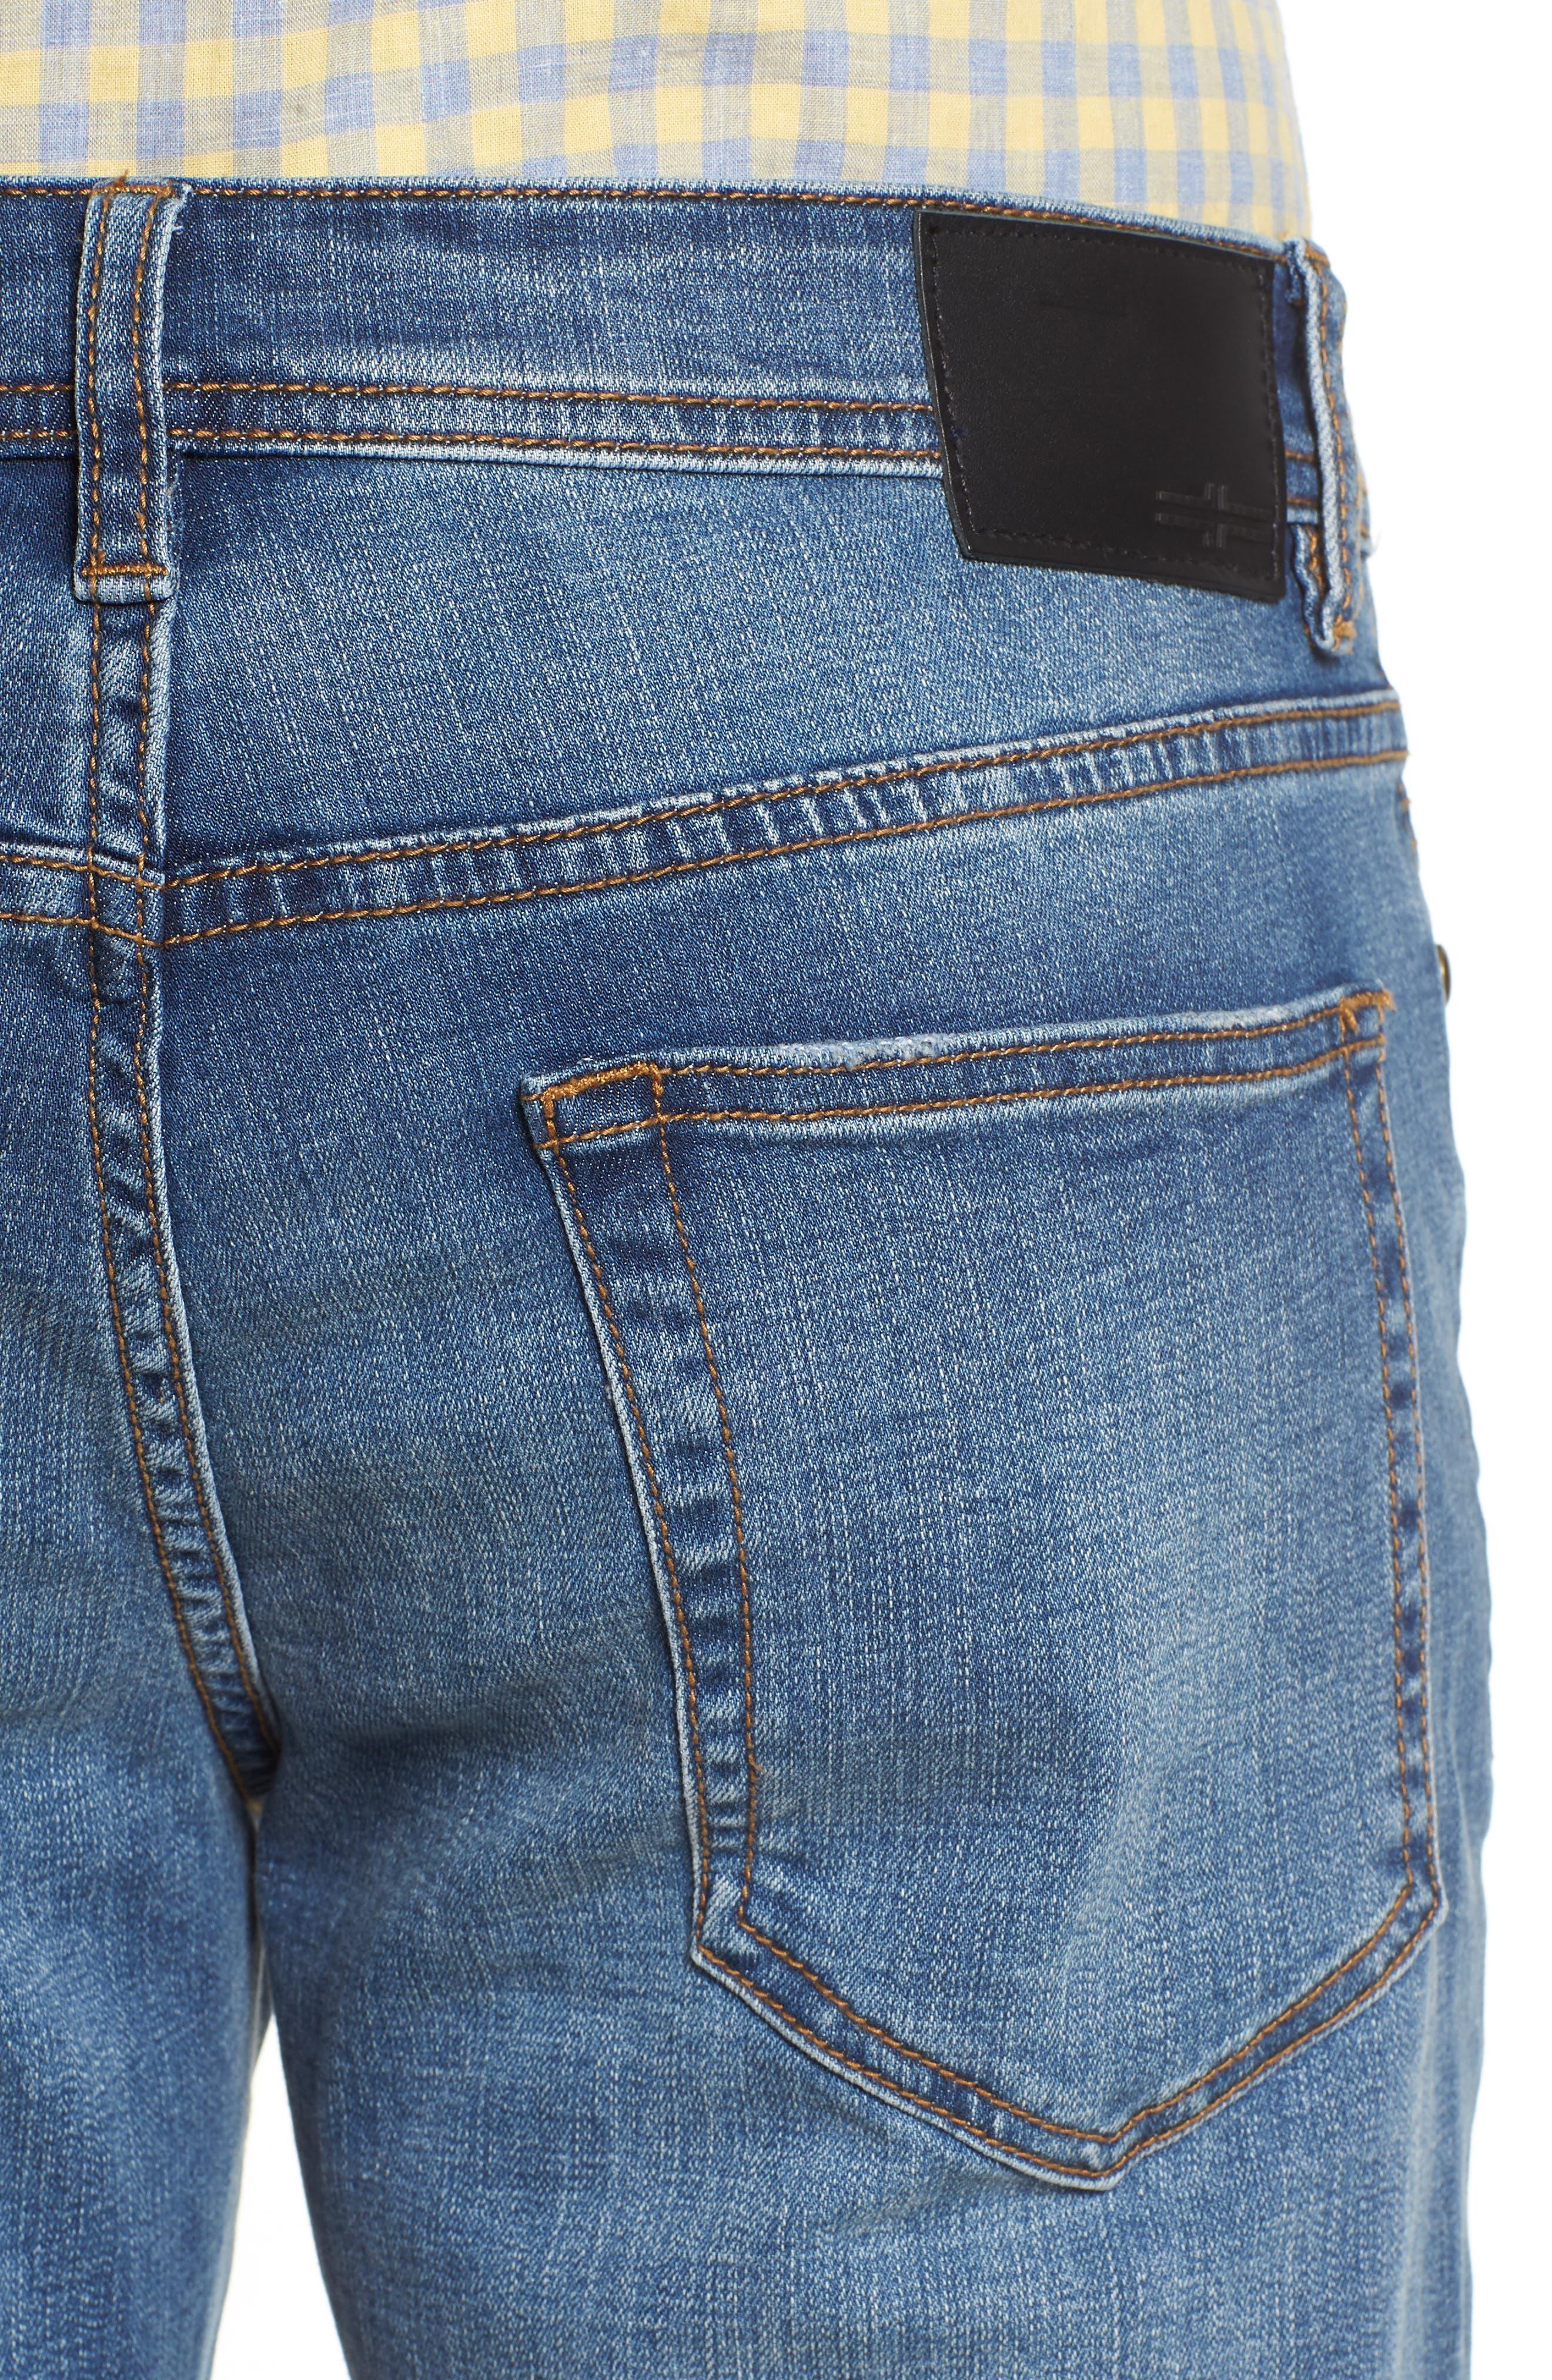 Jeans Co. Regent Relaxed Straight Leg Jeans,                             Alternate thumbnail 4, color,                             402